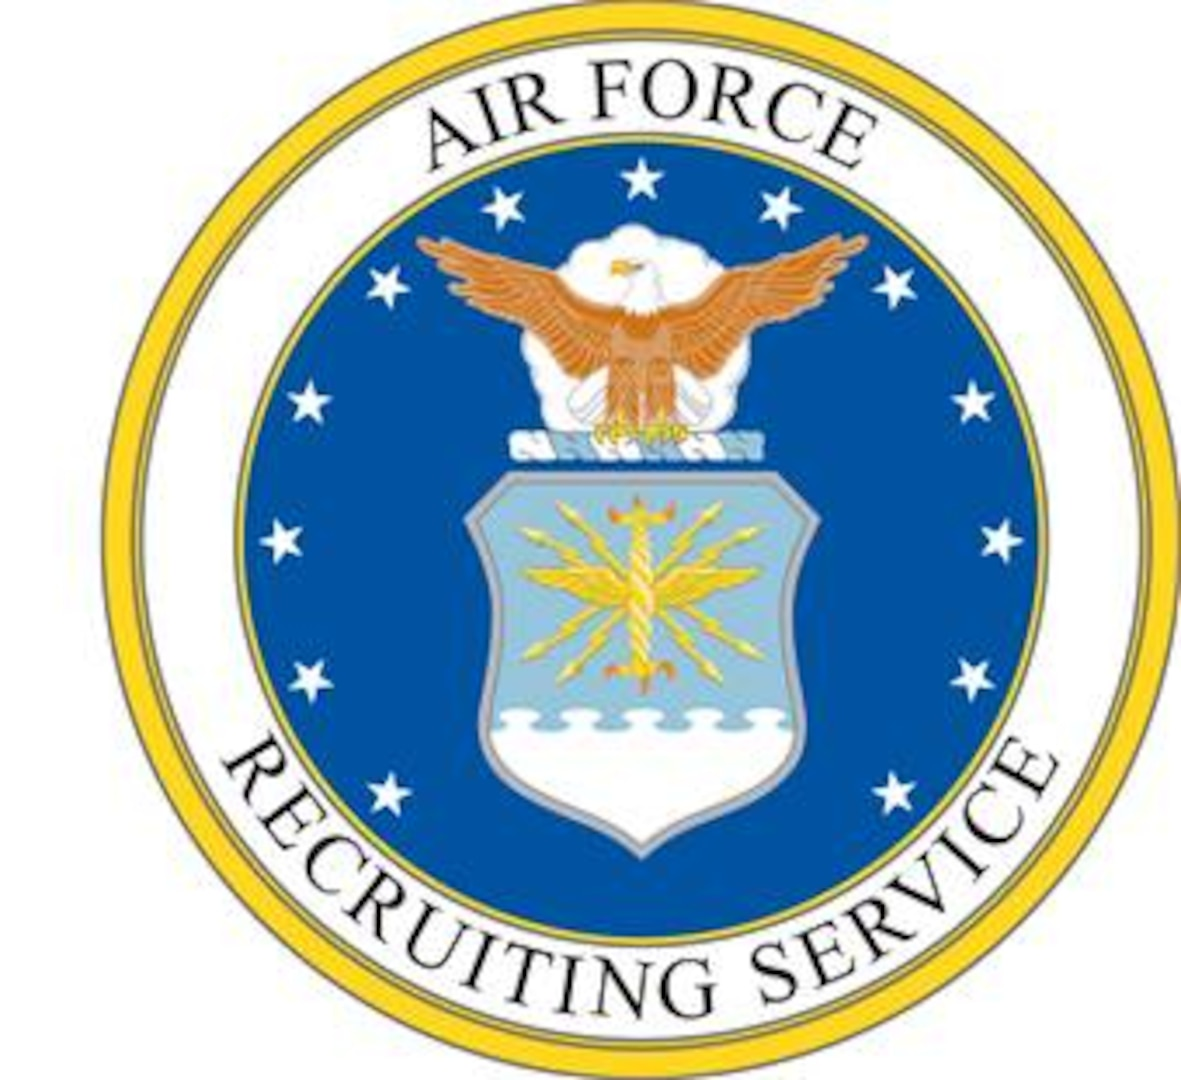 Air Force Recruiting Service logo